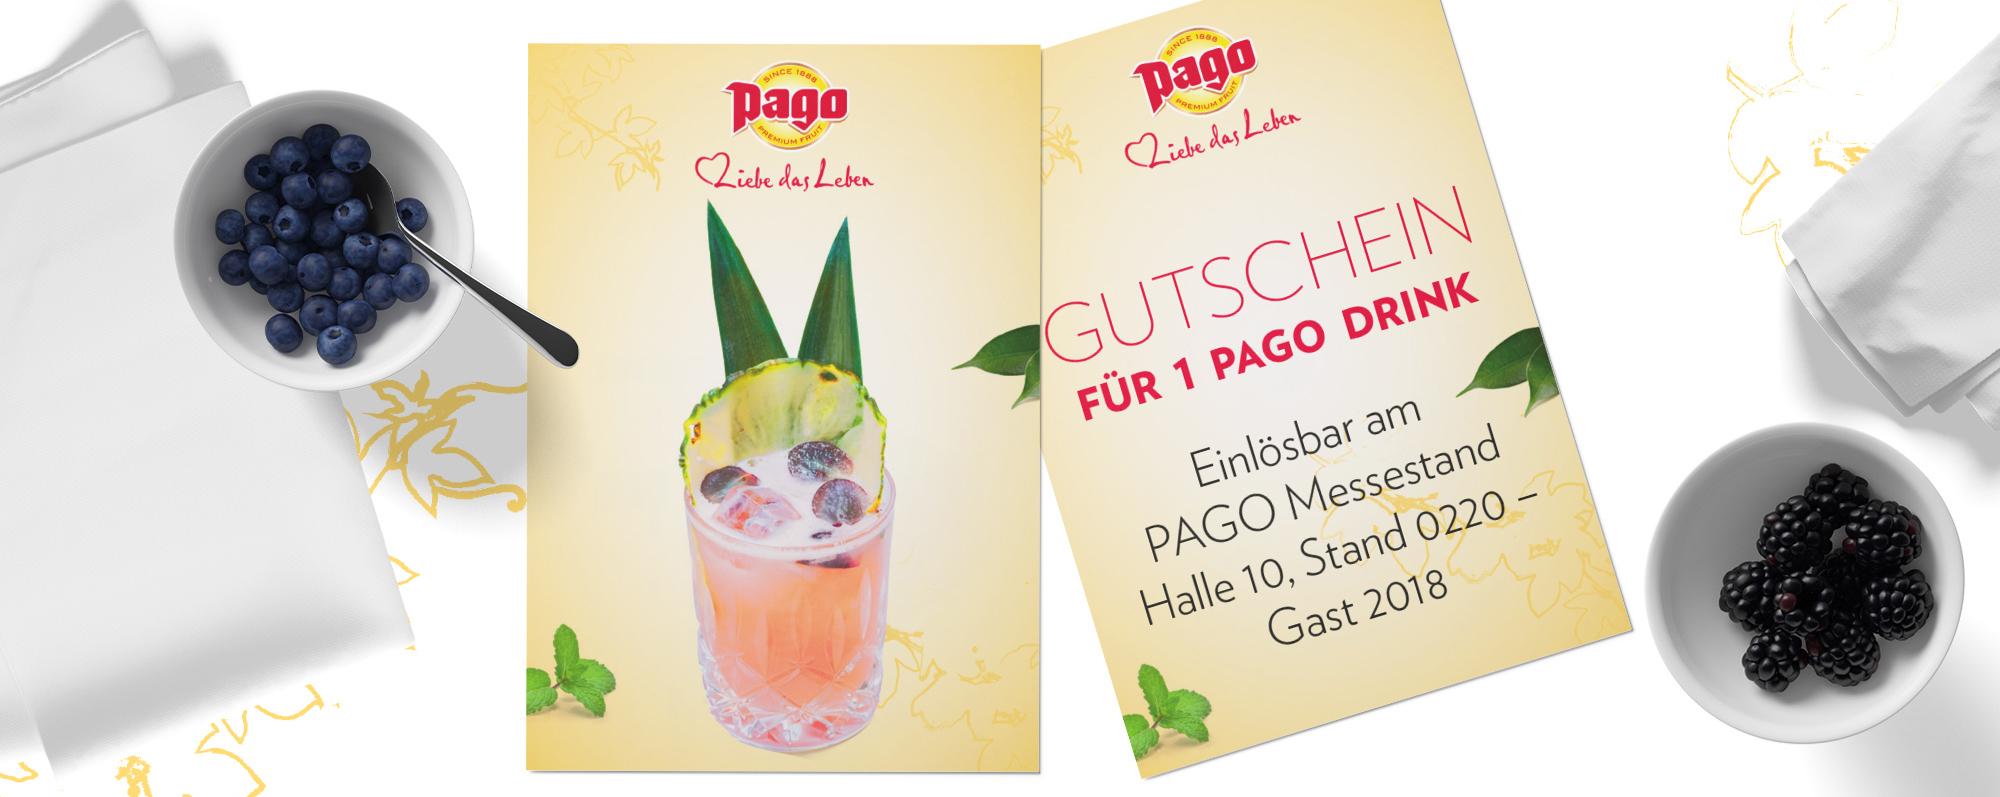 Pago9